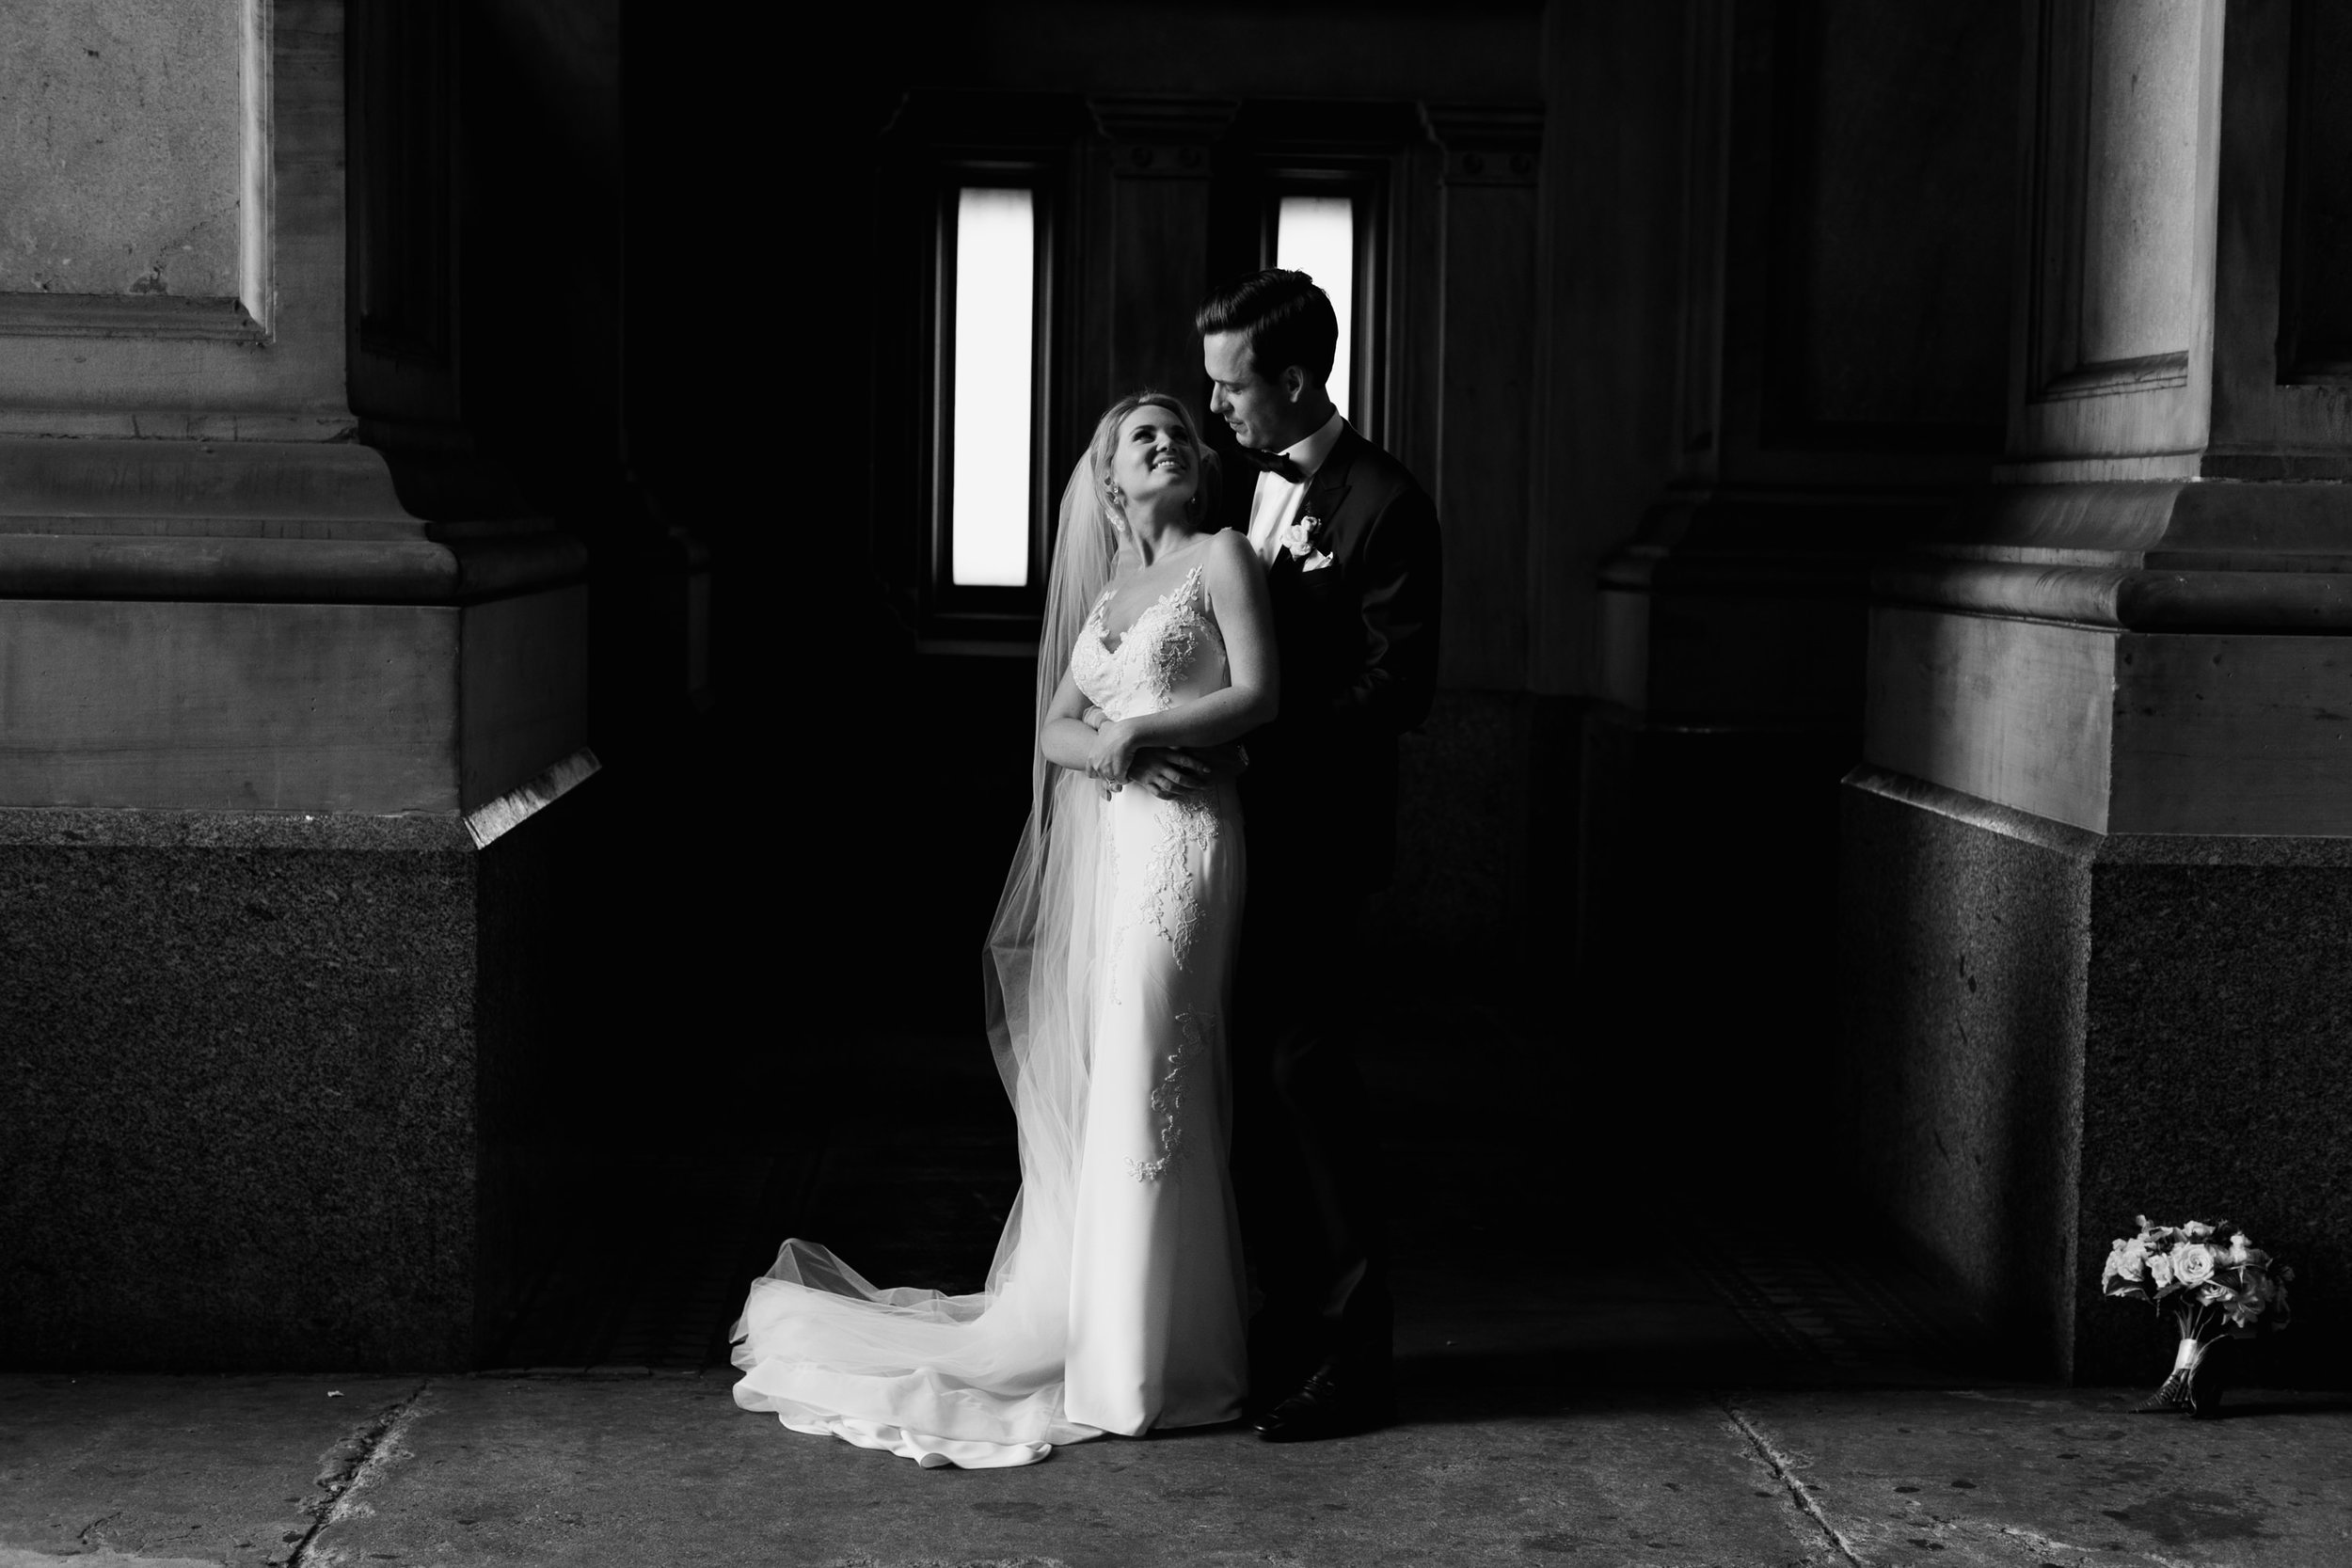 photography-wedding-weddings-natural-candid-union league-philadelphia-black tie-city hall-broad street-editorial-modern-fine-art-29.JPG